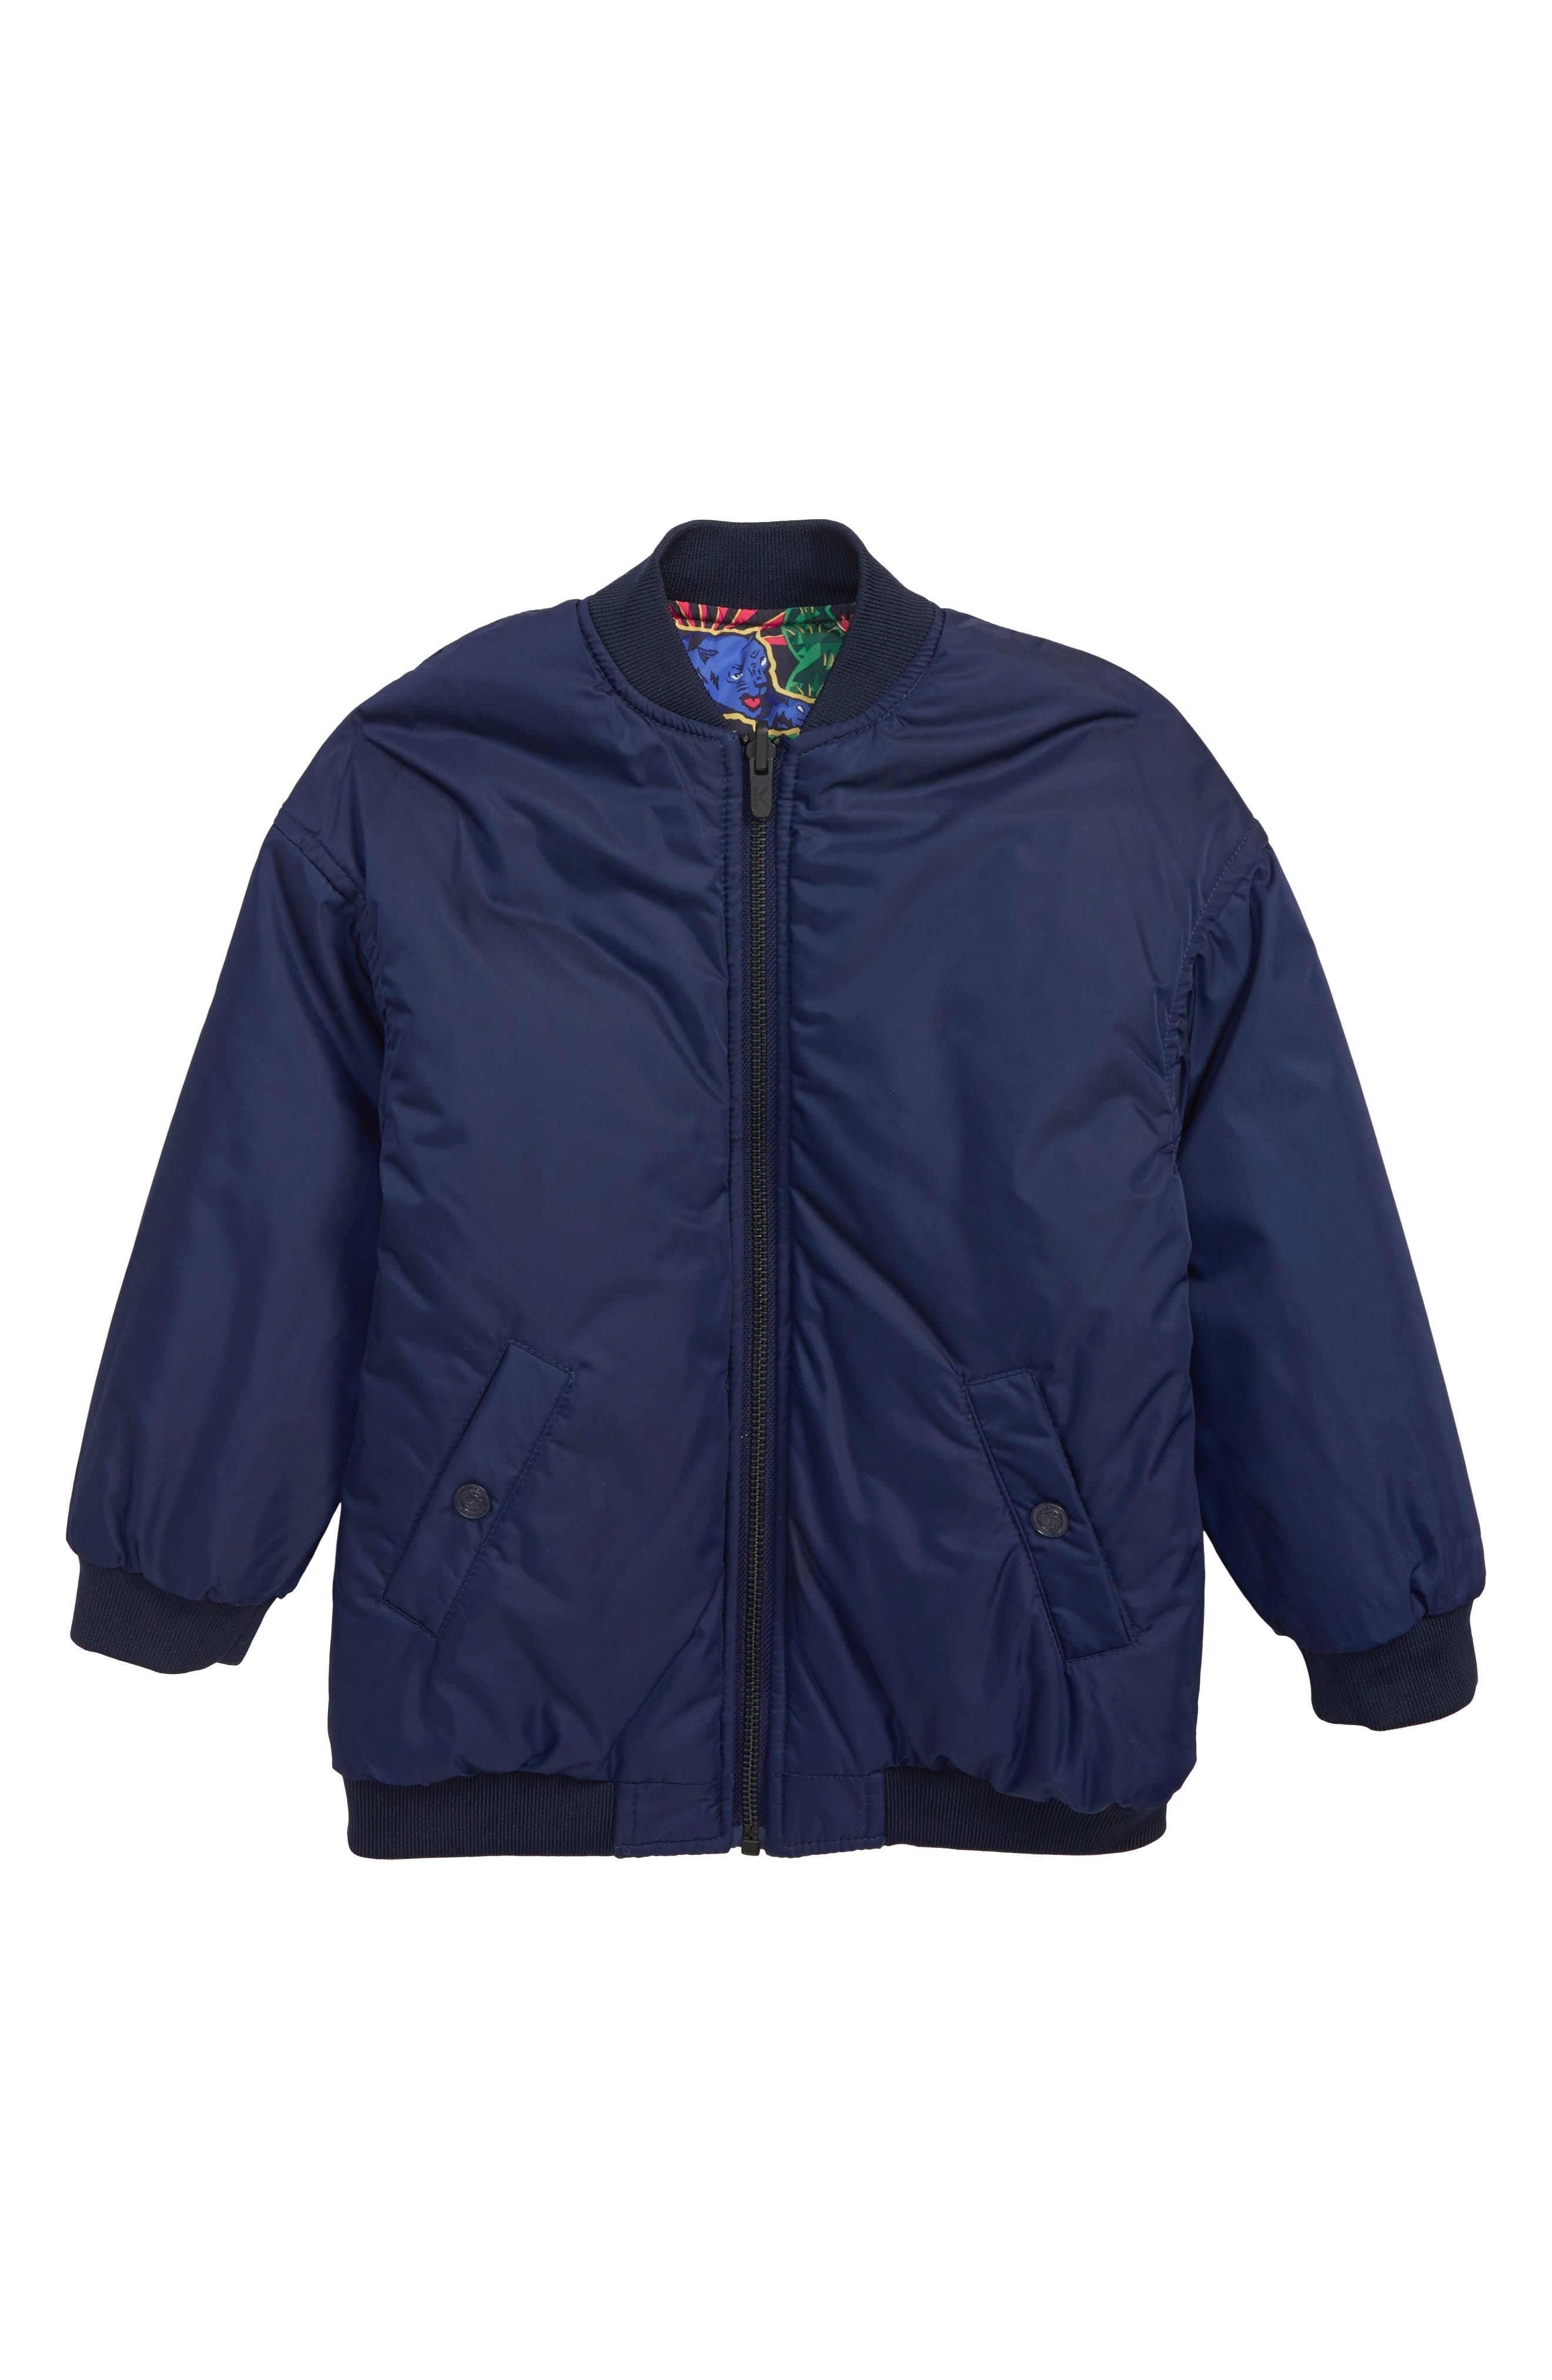 KENZO, Reversible Puffer Jacket, Alternate thumbnail 2, color, NAVY